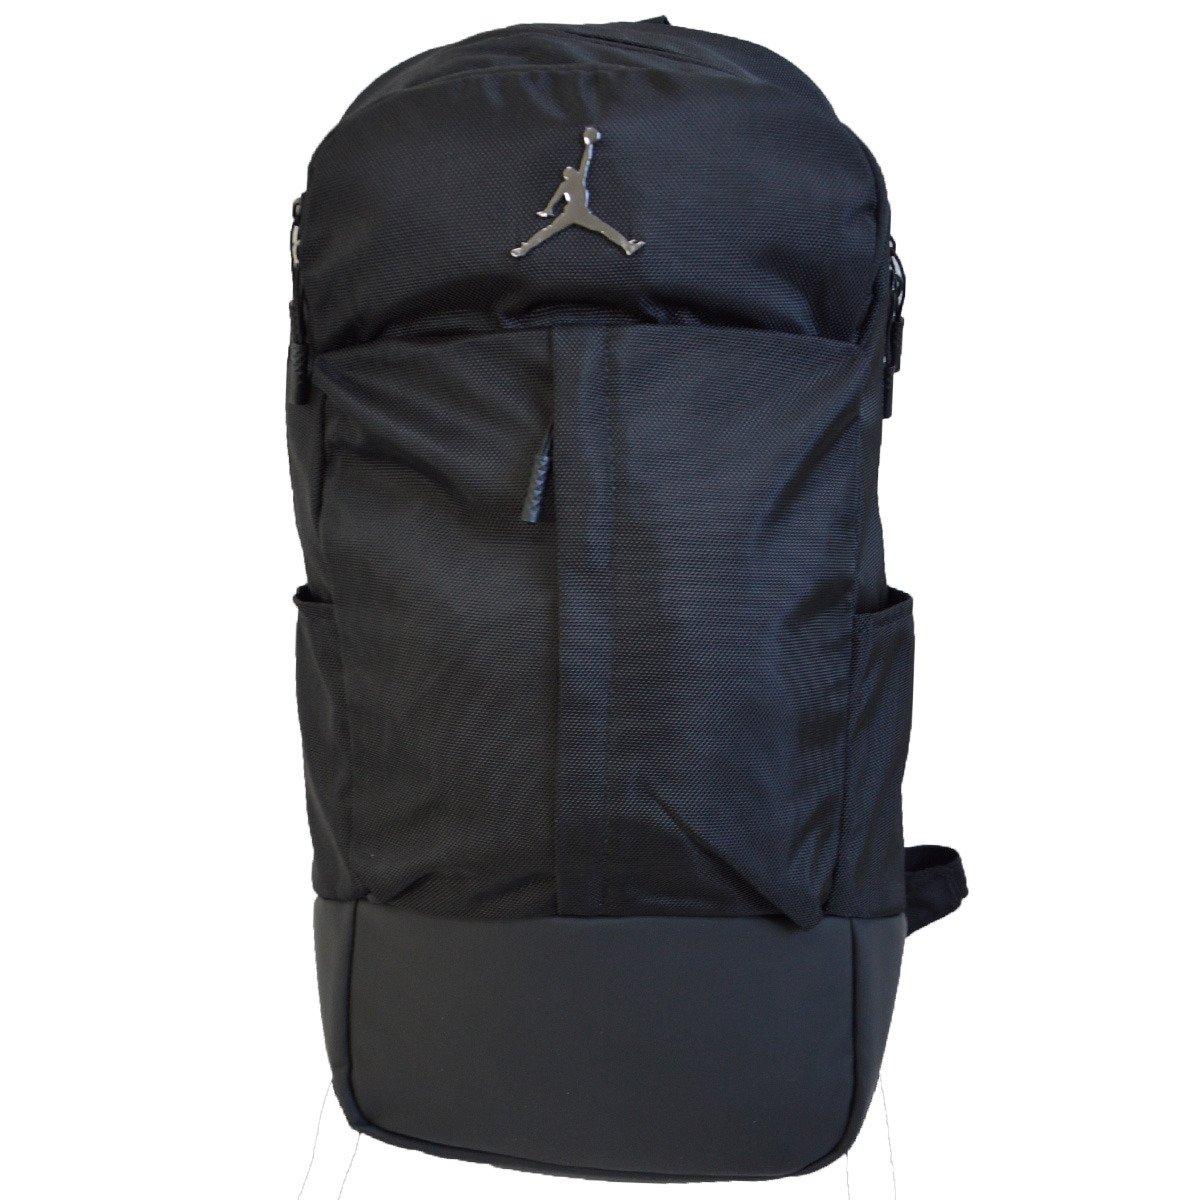 2e8f9a4939a43e Air Jordan Fluid Backpack - 9B0166-023